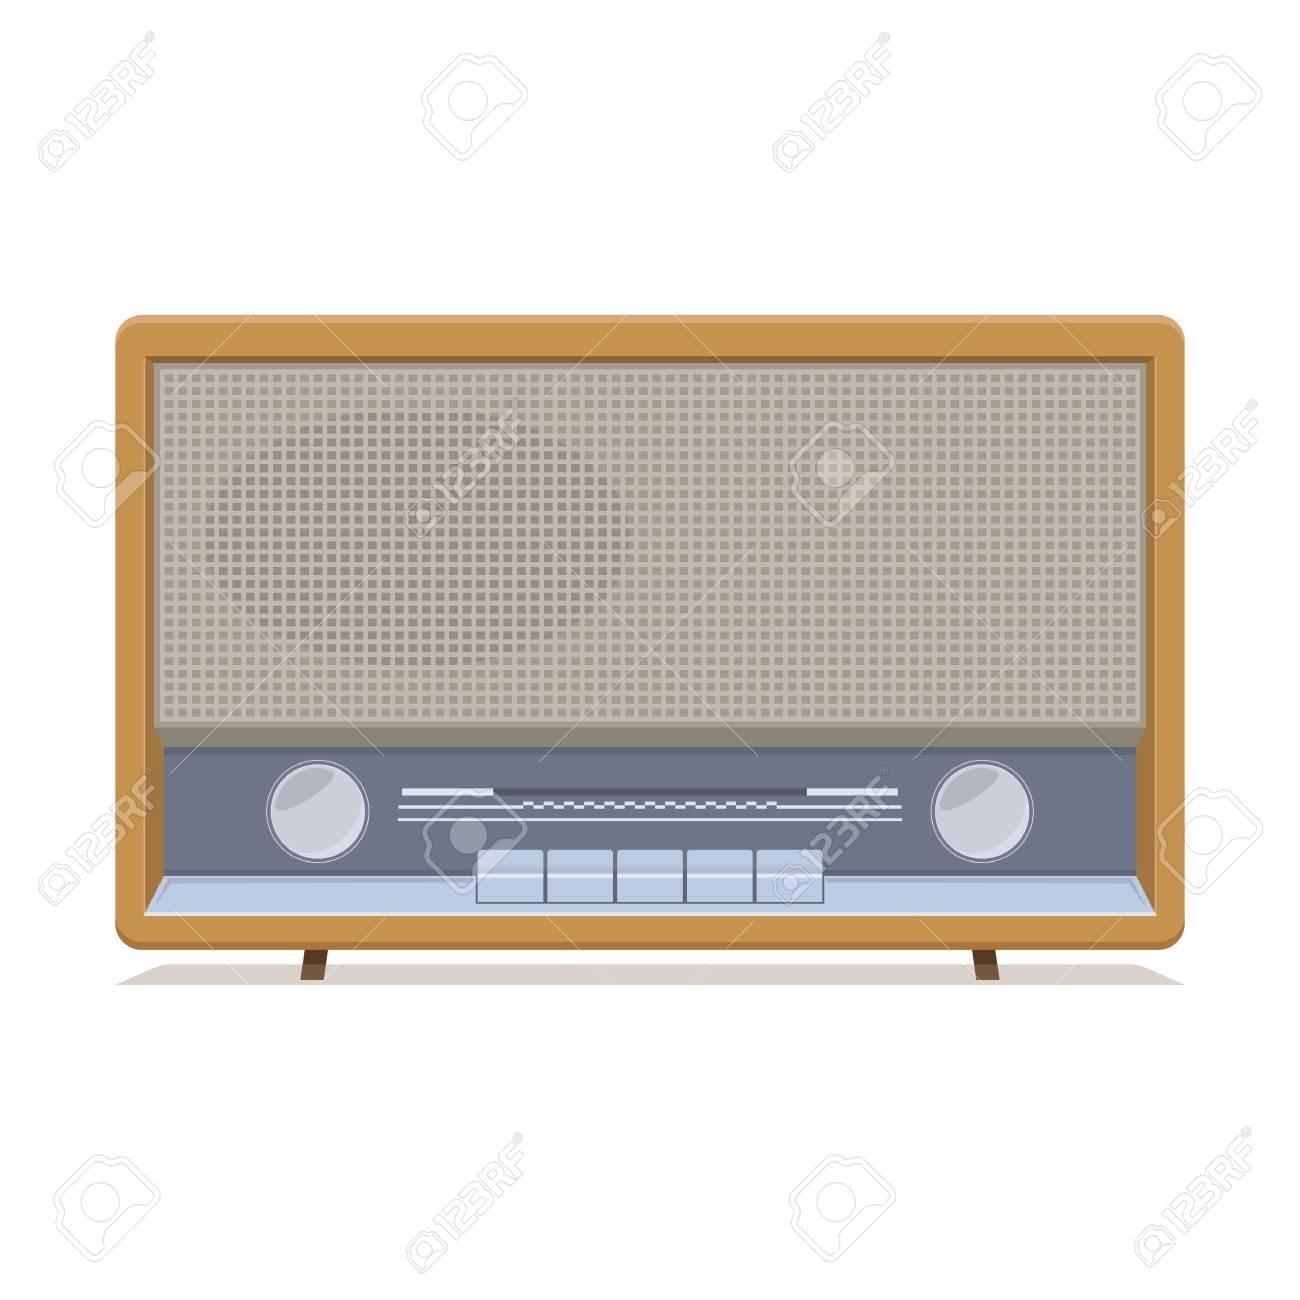 Radio retro  Old Radio  Illustration of an old radio receiver